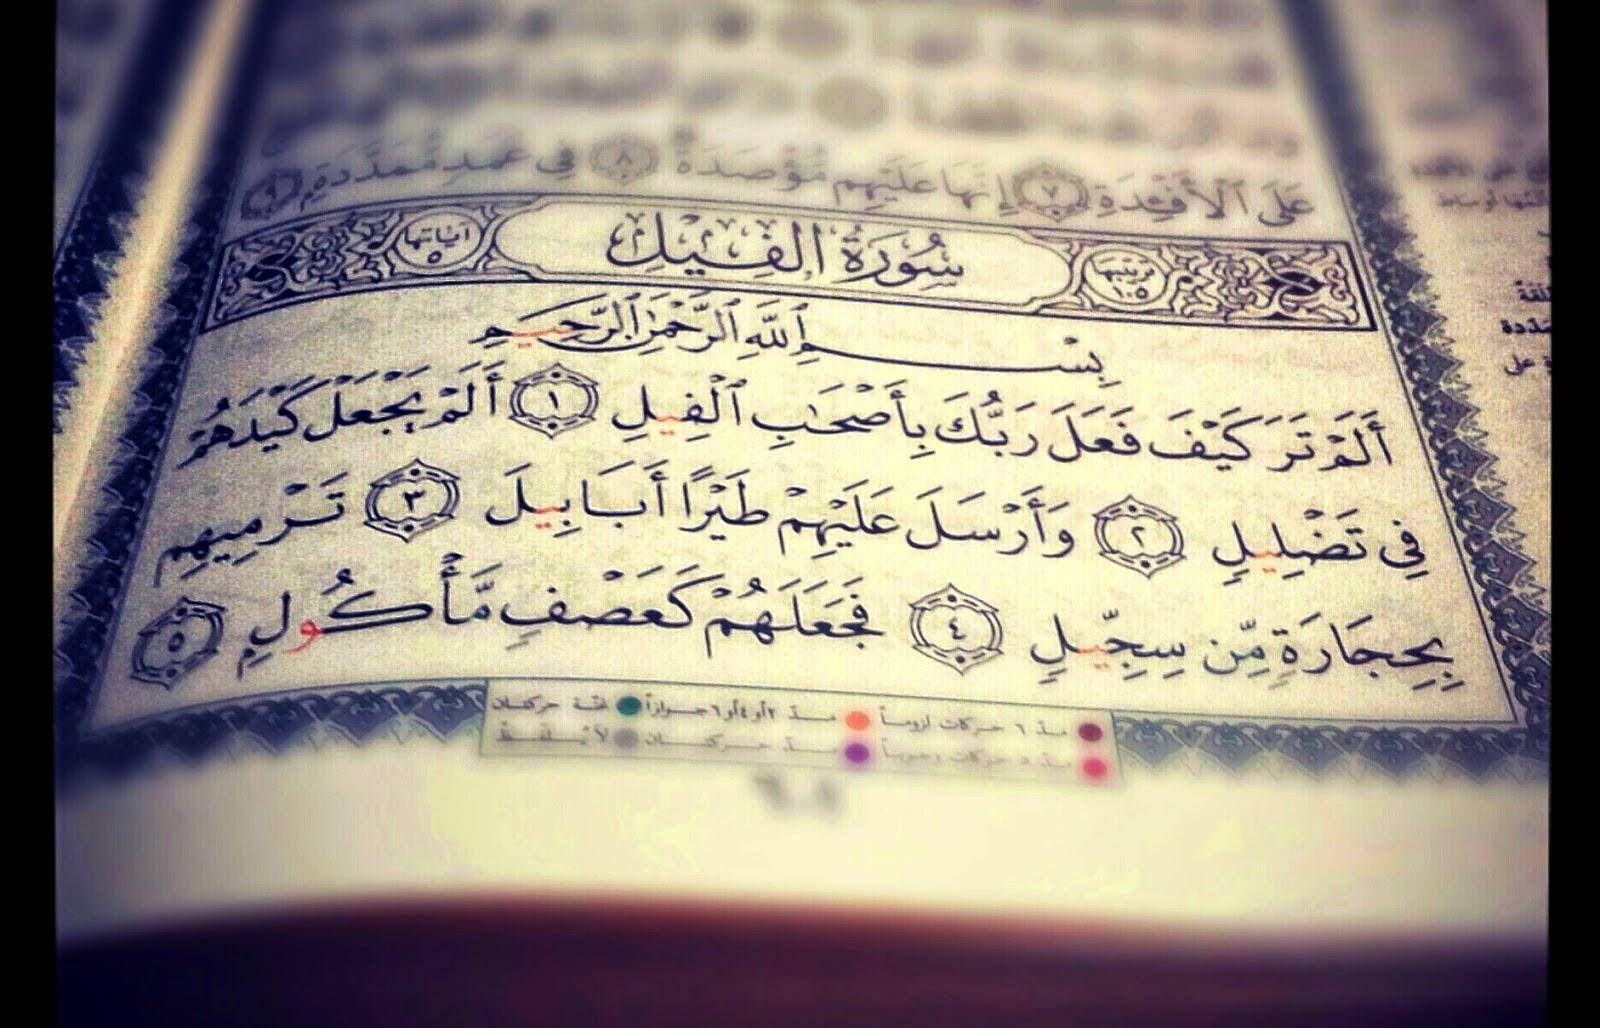 Ramadhan Bulan Al-Quran Diturunkan, Ramadhan, Al-Quran